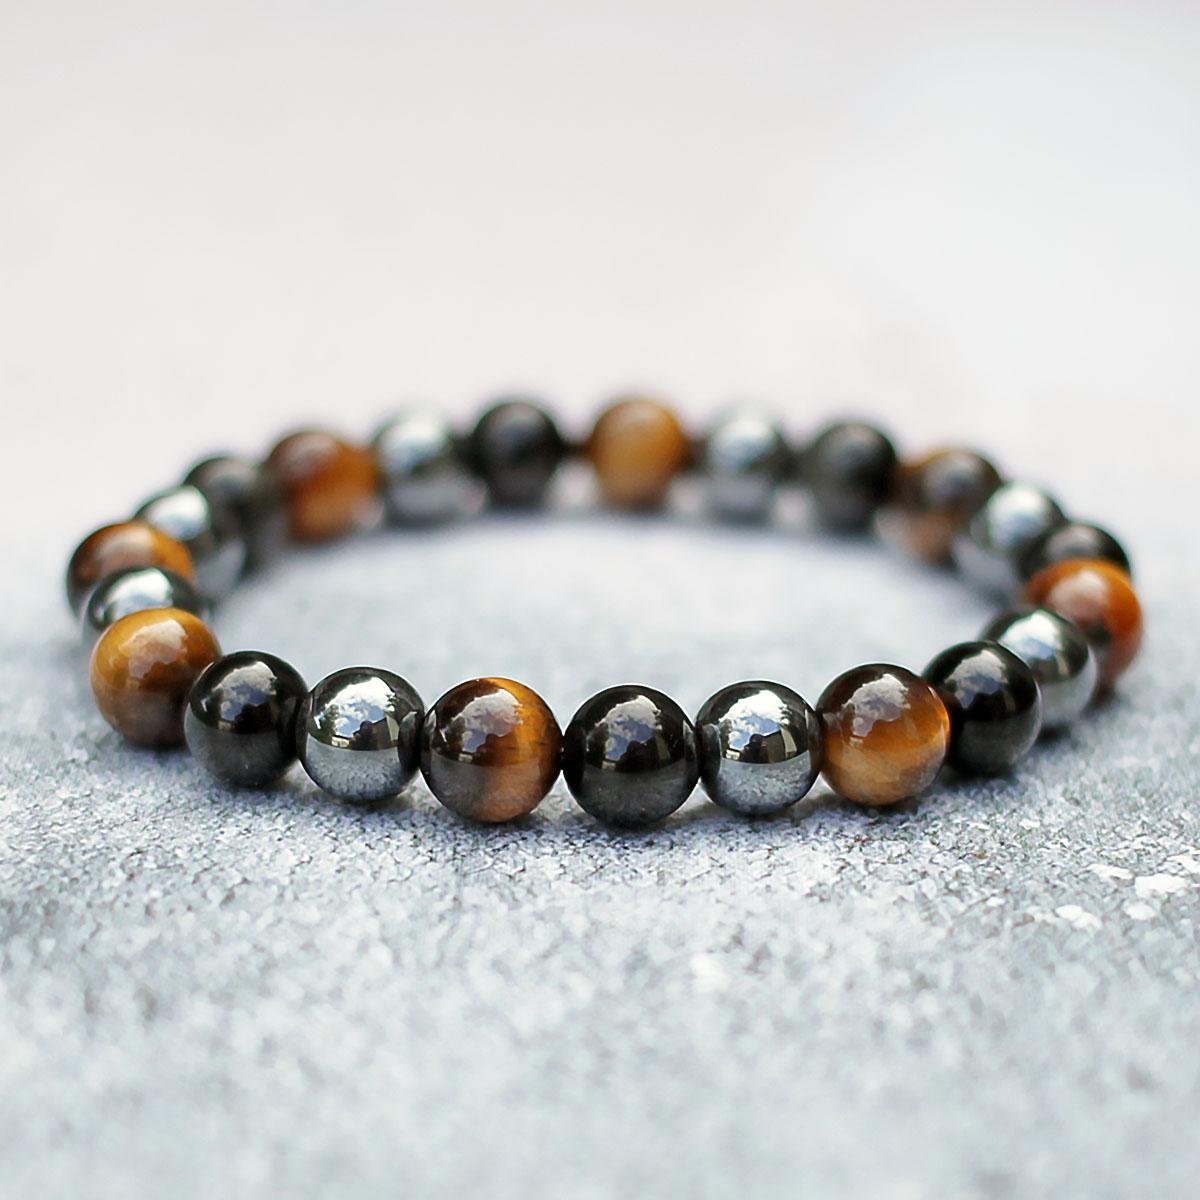 obsidian-tigers-eye-hematite-bracelet-05